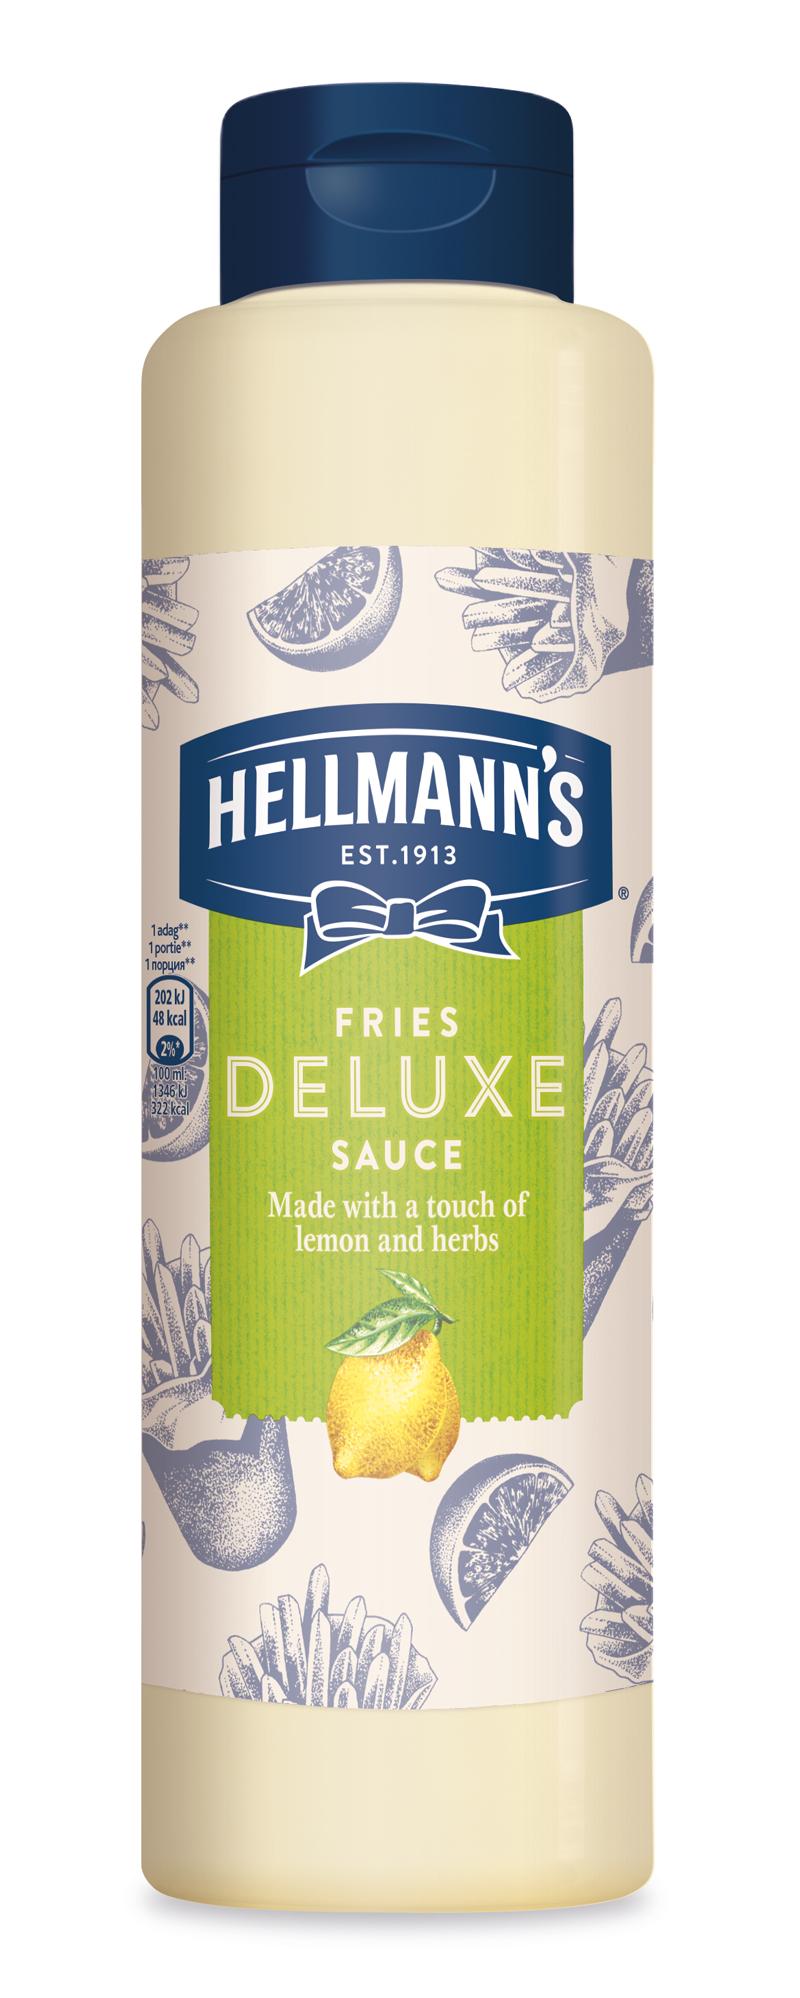 Hellmann's Майонезен сос Фрайс 850 ml - Street Food с качеството на Hellmann`s